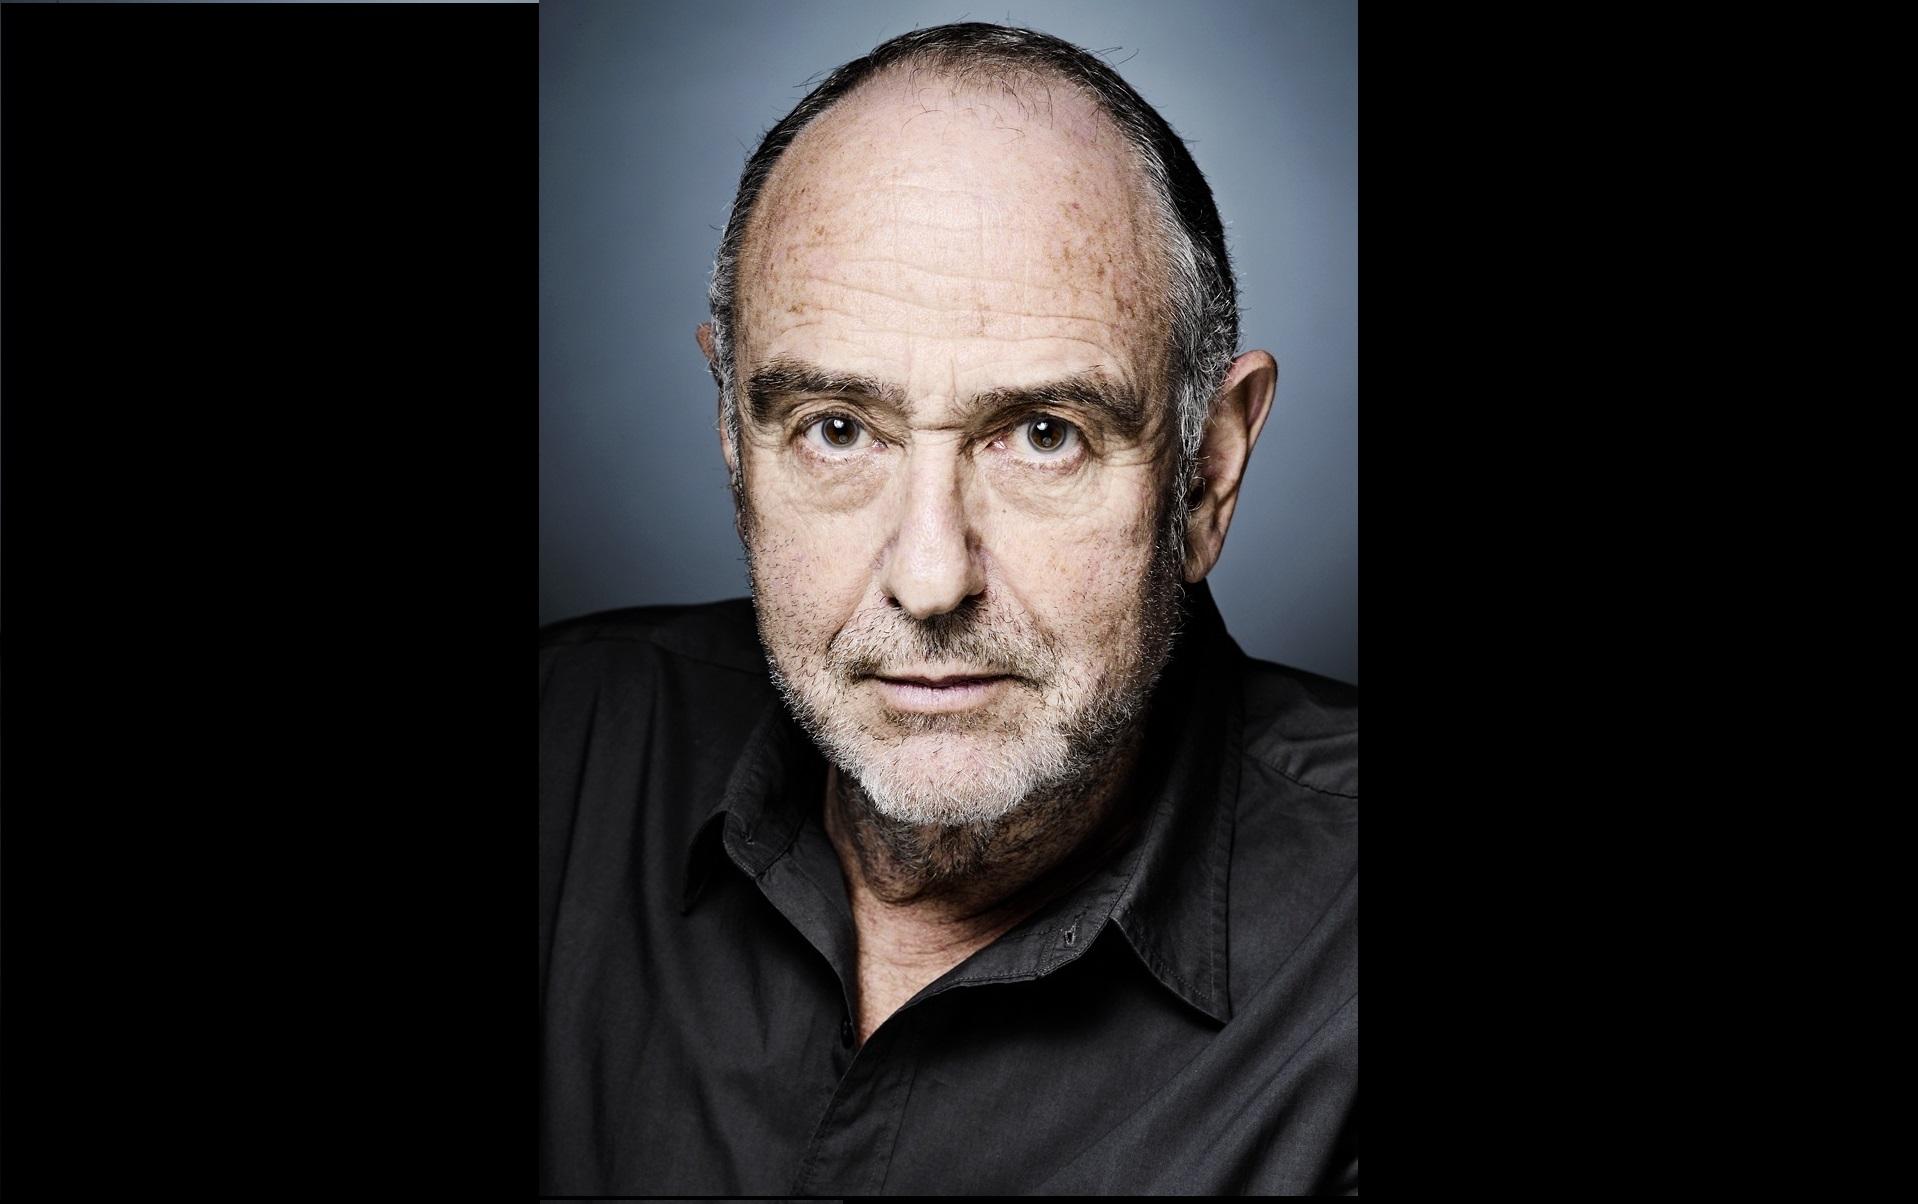 'Les Mis' creator Claude-Michel Schönberg to become visiting professor